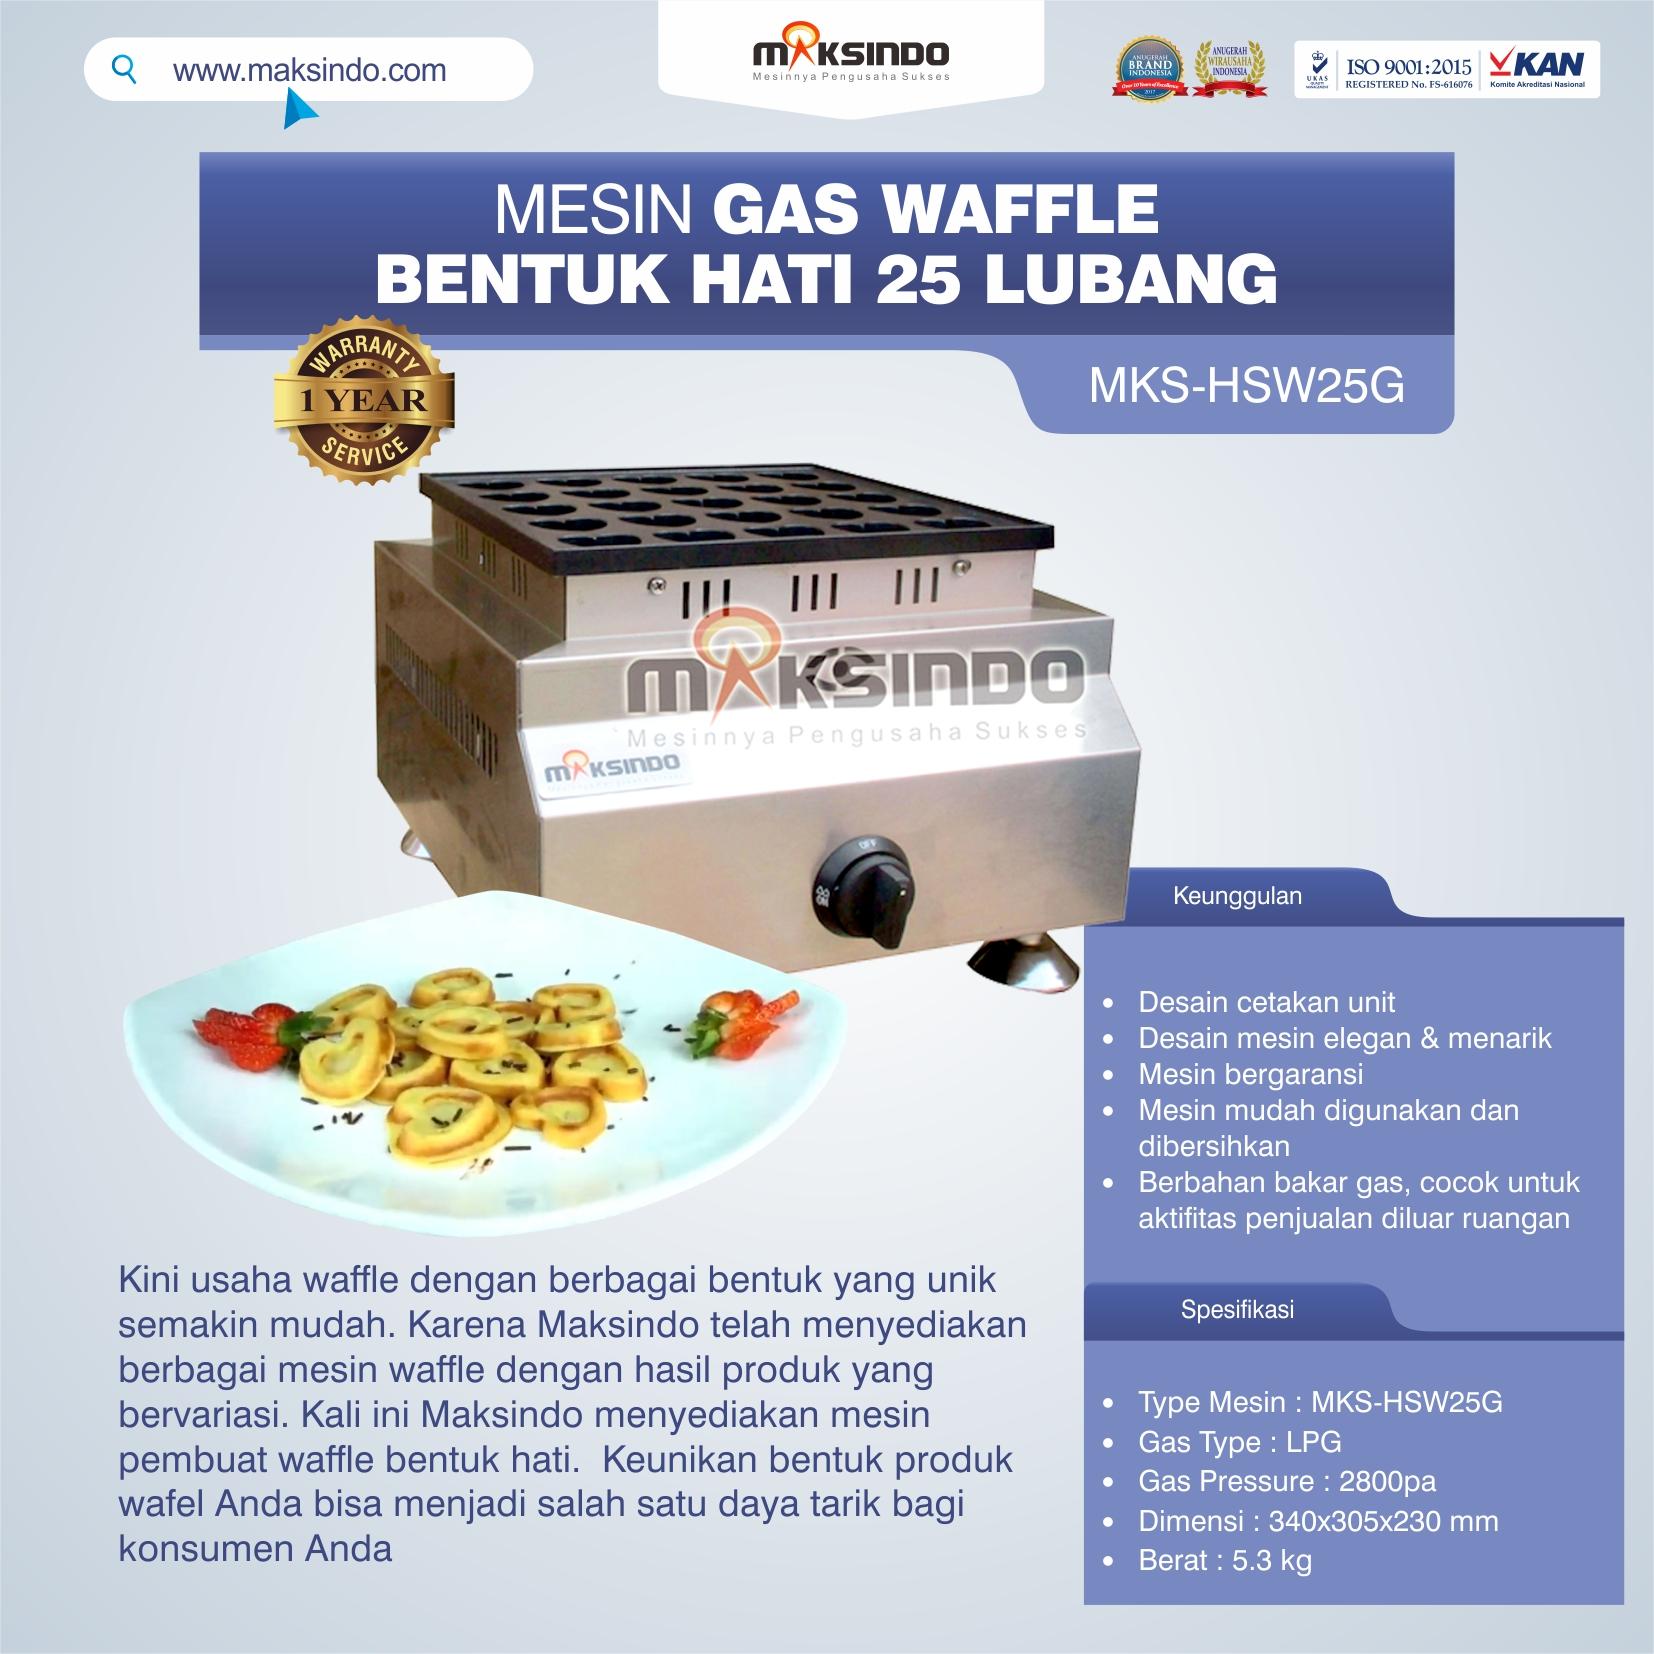 Jual Gas Waffle Bentuk Hati 25 Lubang MKS-HSW25G di Yogyakarta